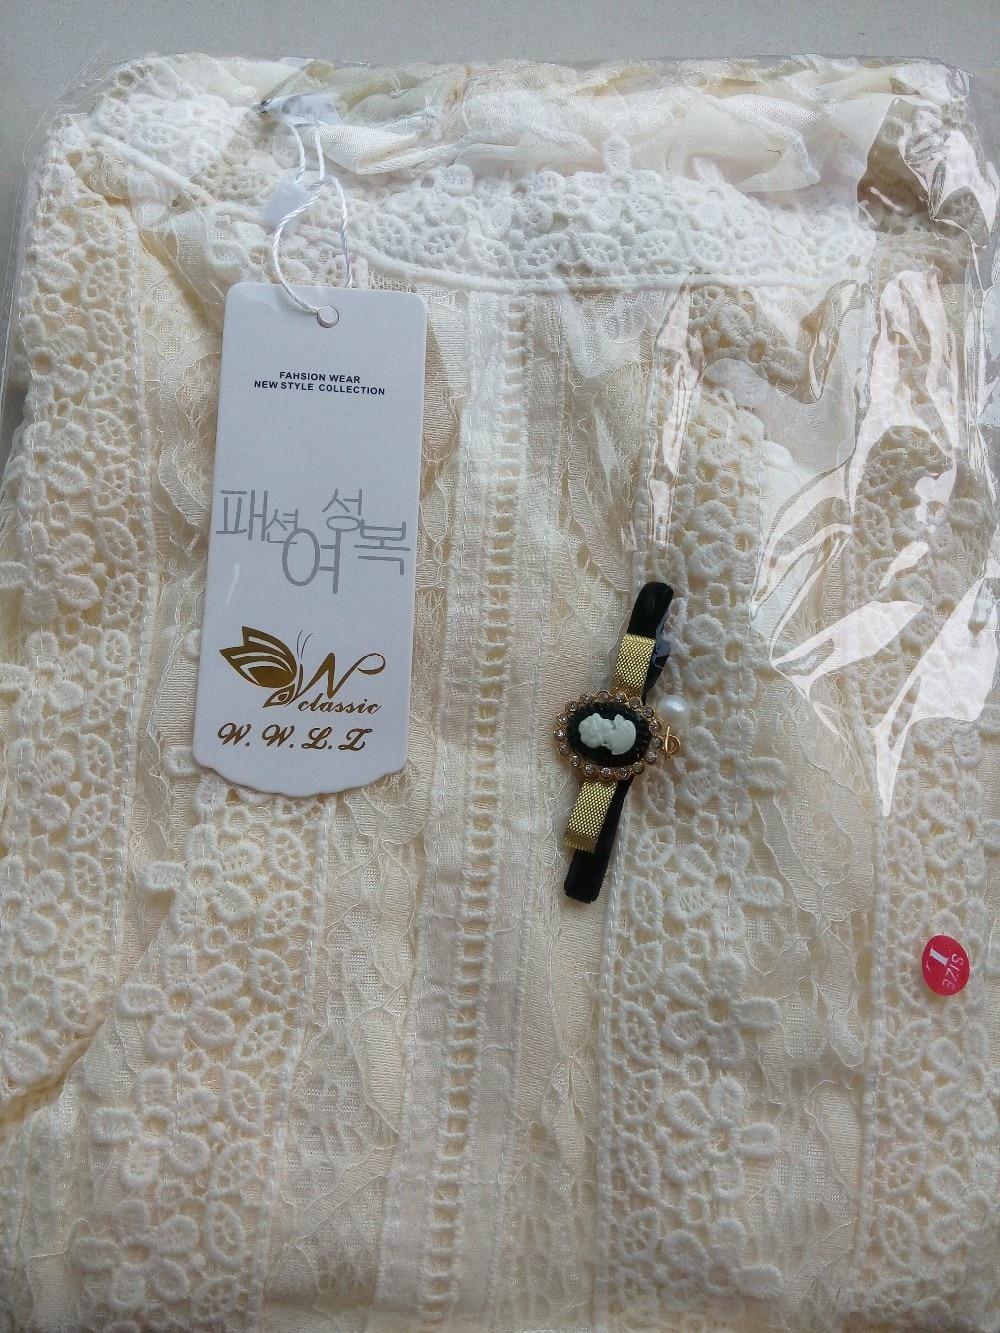 19 women tops and blouses Women Clothing fashion Blusas Femininas Blouses Women Shirts Crochet Blouse Lace Shirt clothes 999 19